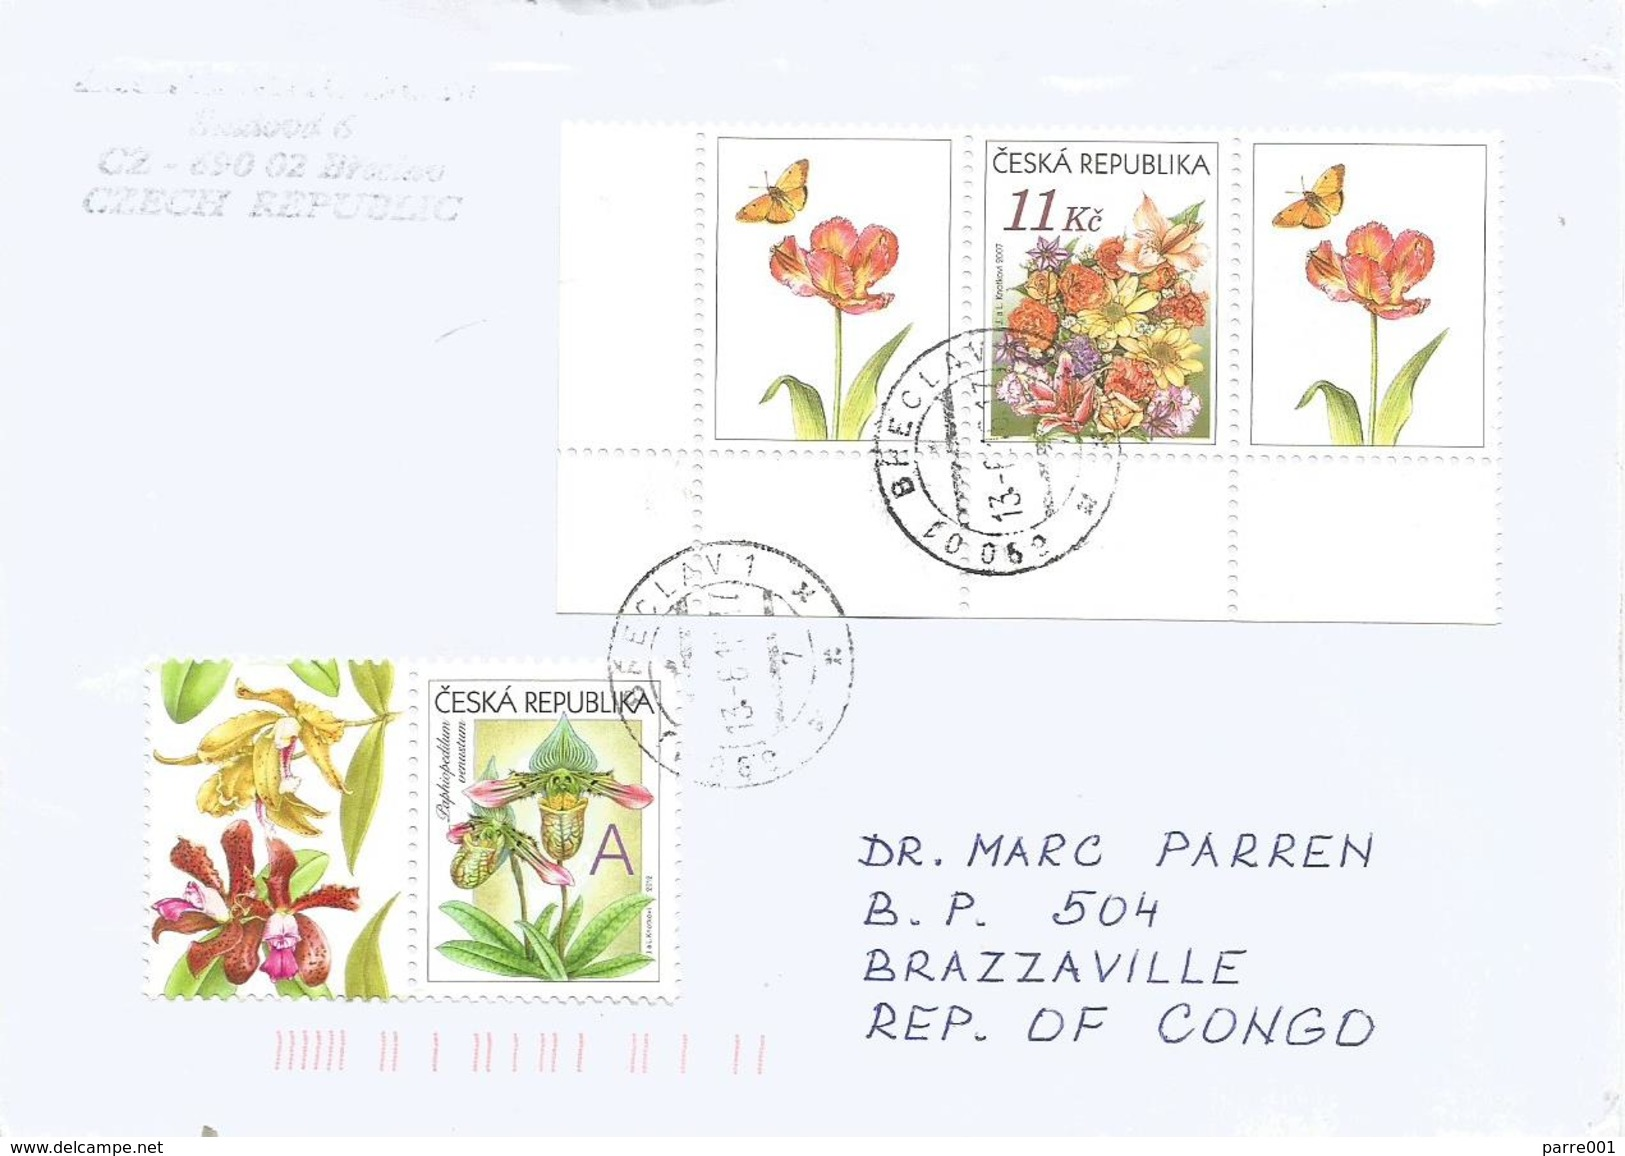 Czech Republic 2016 Breclav Orchid Paphiopedilum Venustum Tulip Butterfly Cover - Tsjechië